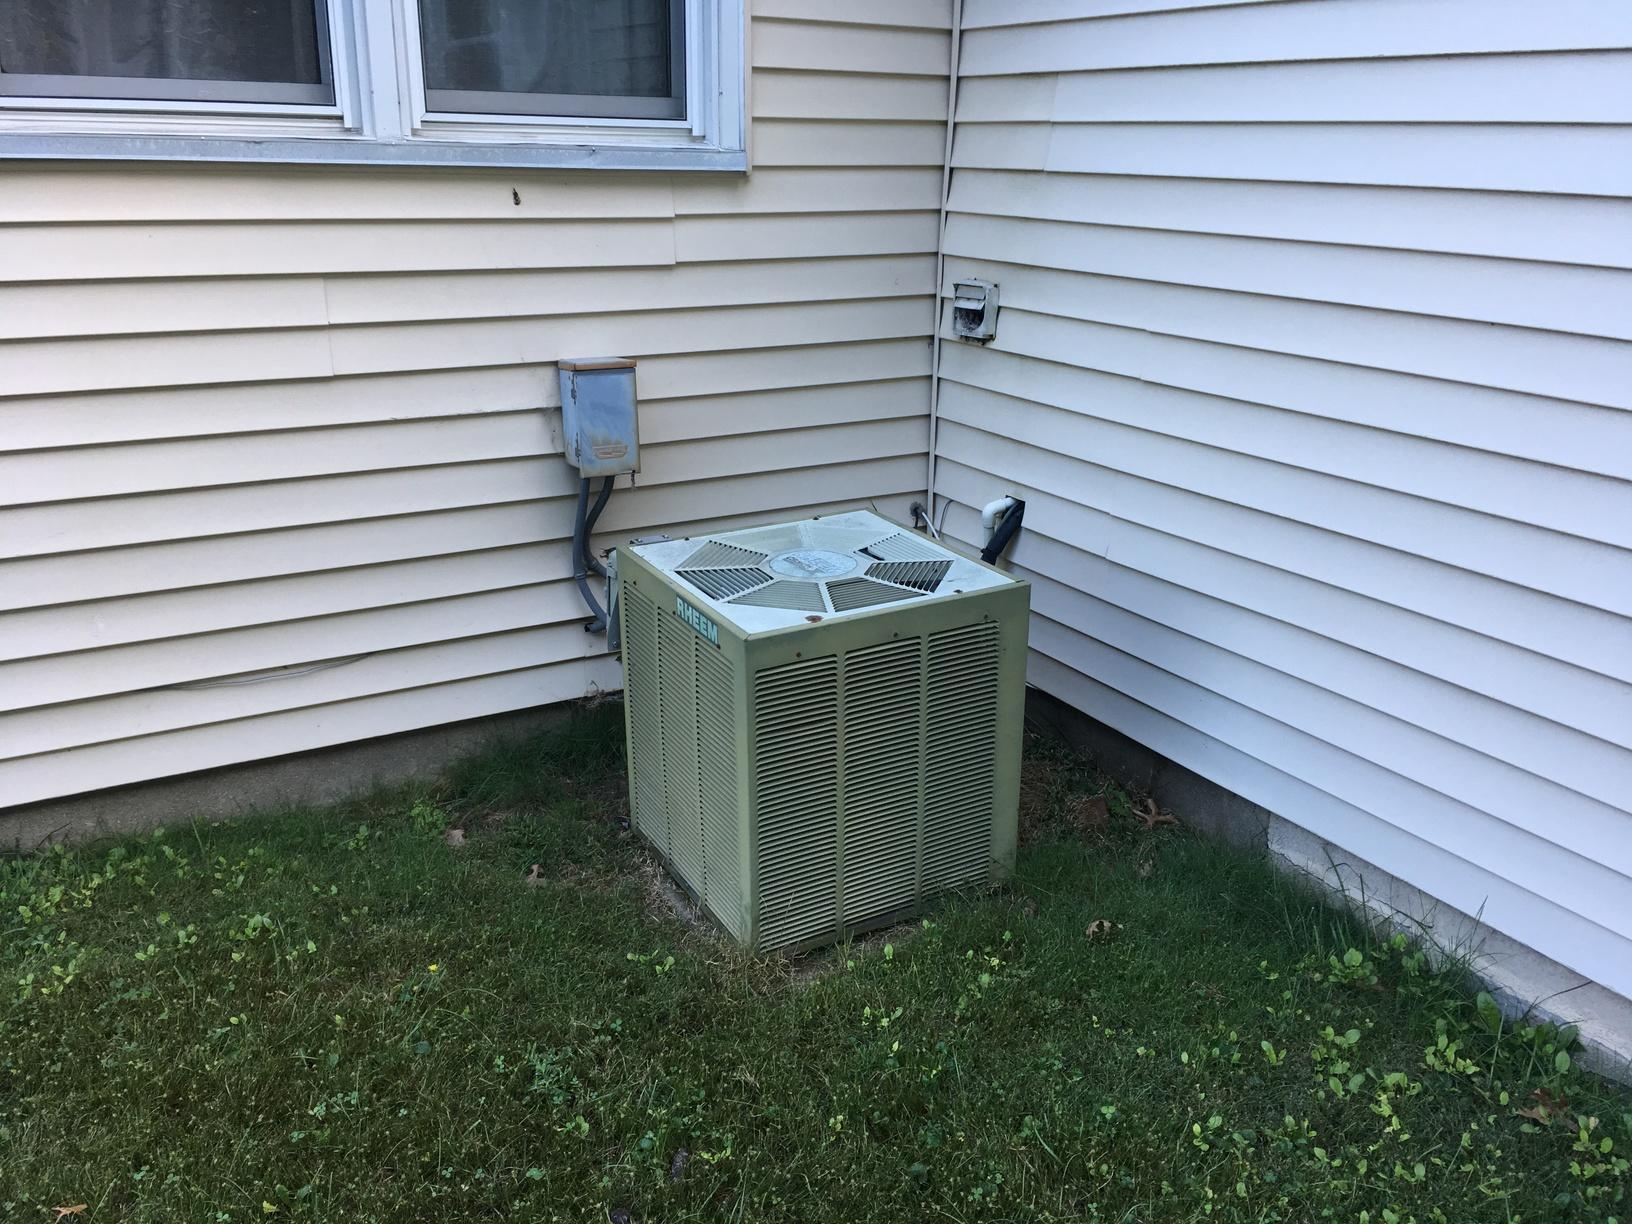 Amana High Efficiency Air Conditioner Barrington, NJ 08007 - Before Photo